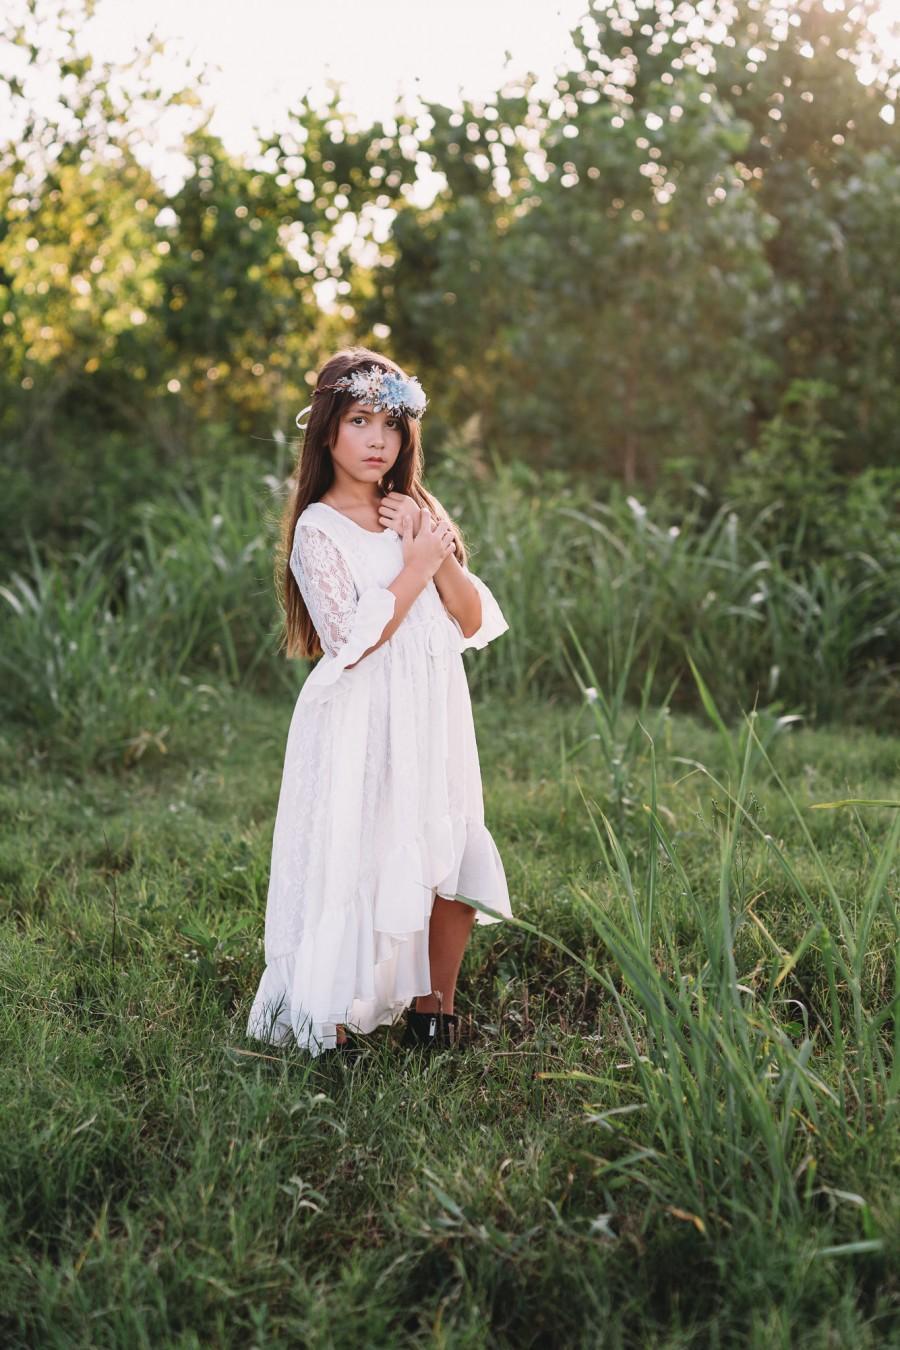 Свадьба - Rustic Flower Girl Lace Dress for Boho Wedding Bohemian White Beach Maxi Dress Girls Toddlers Tween Shabby Junior Bridesmaid Lace Dress Mara